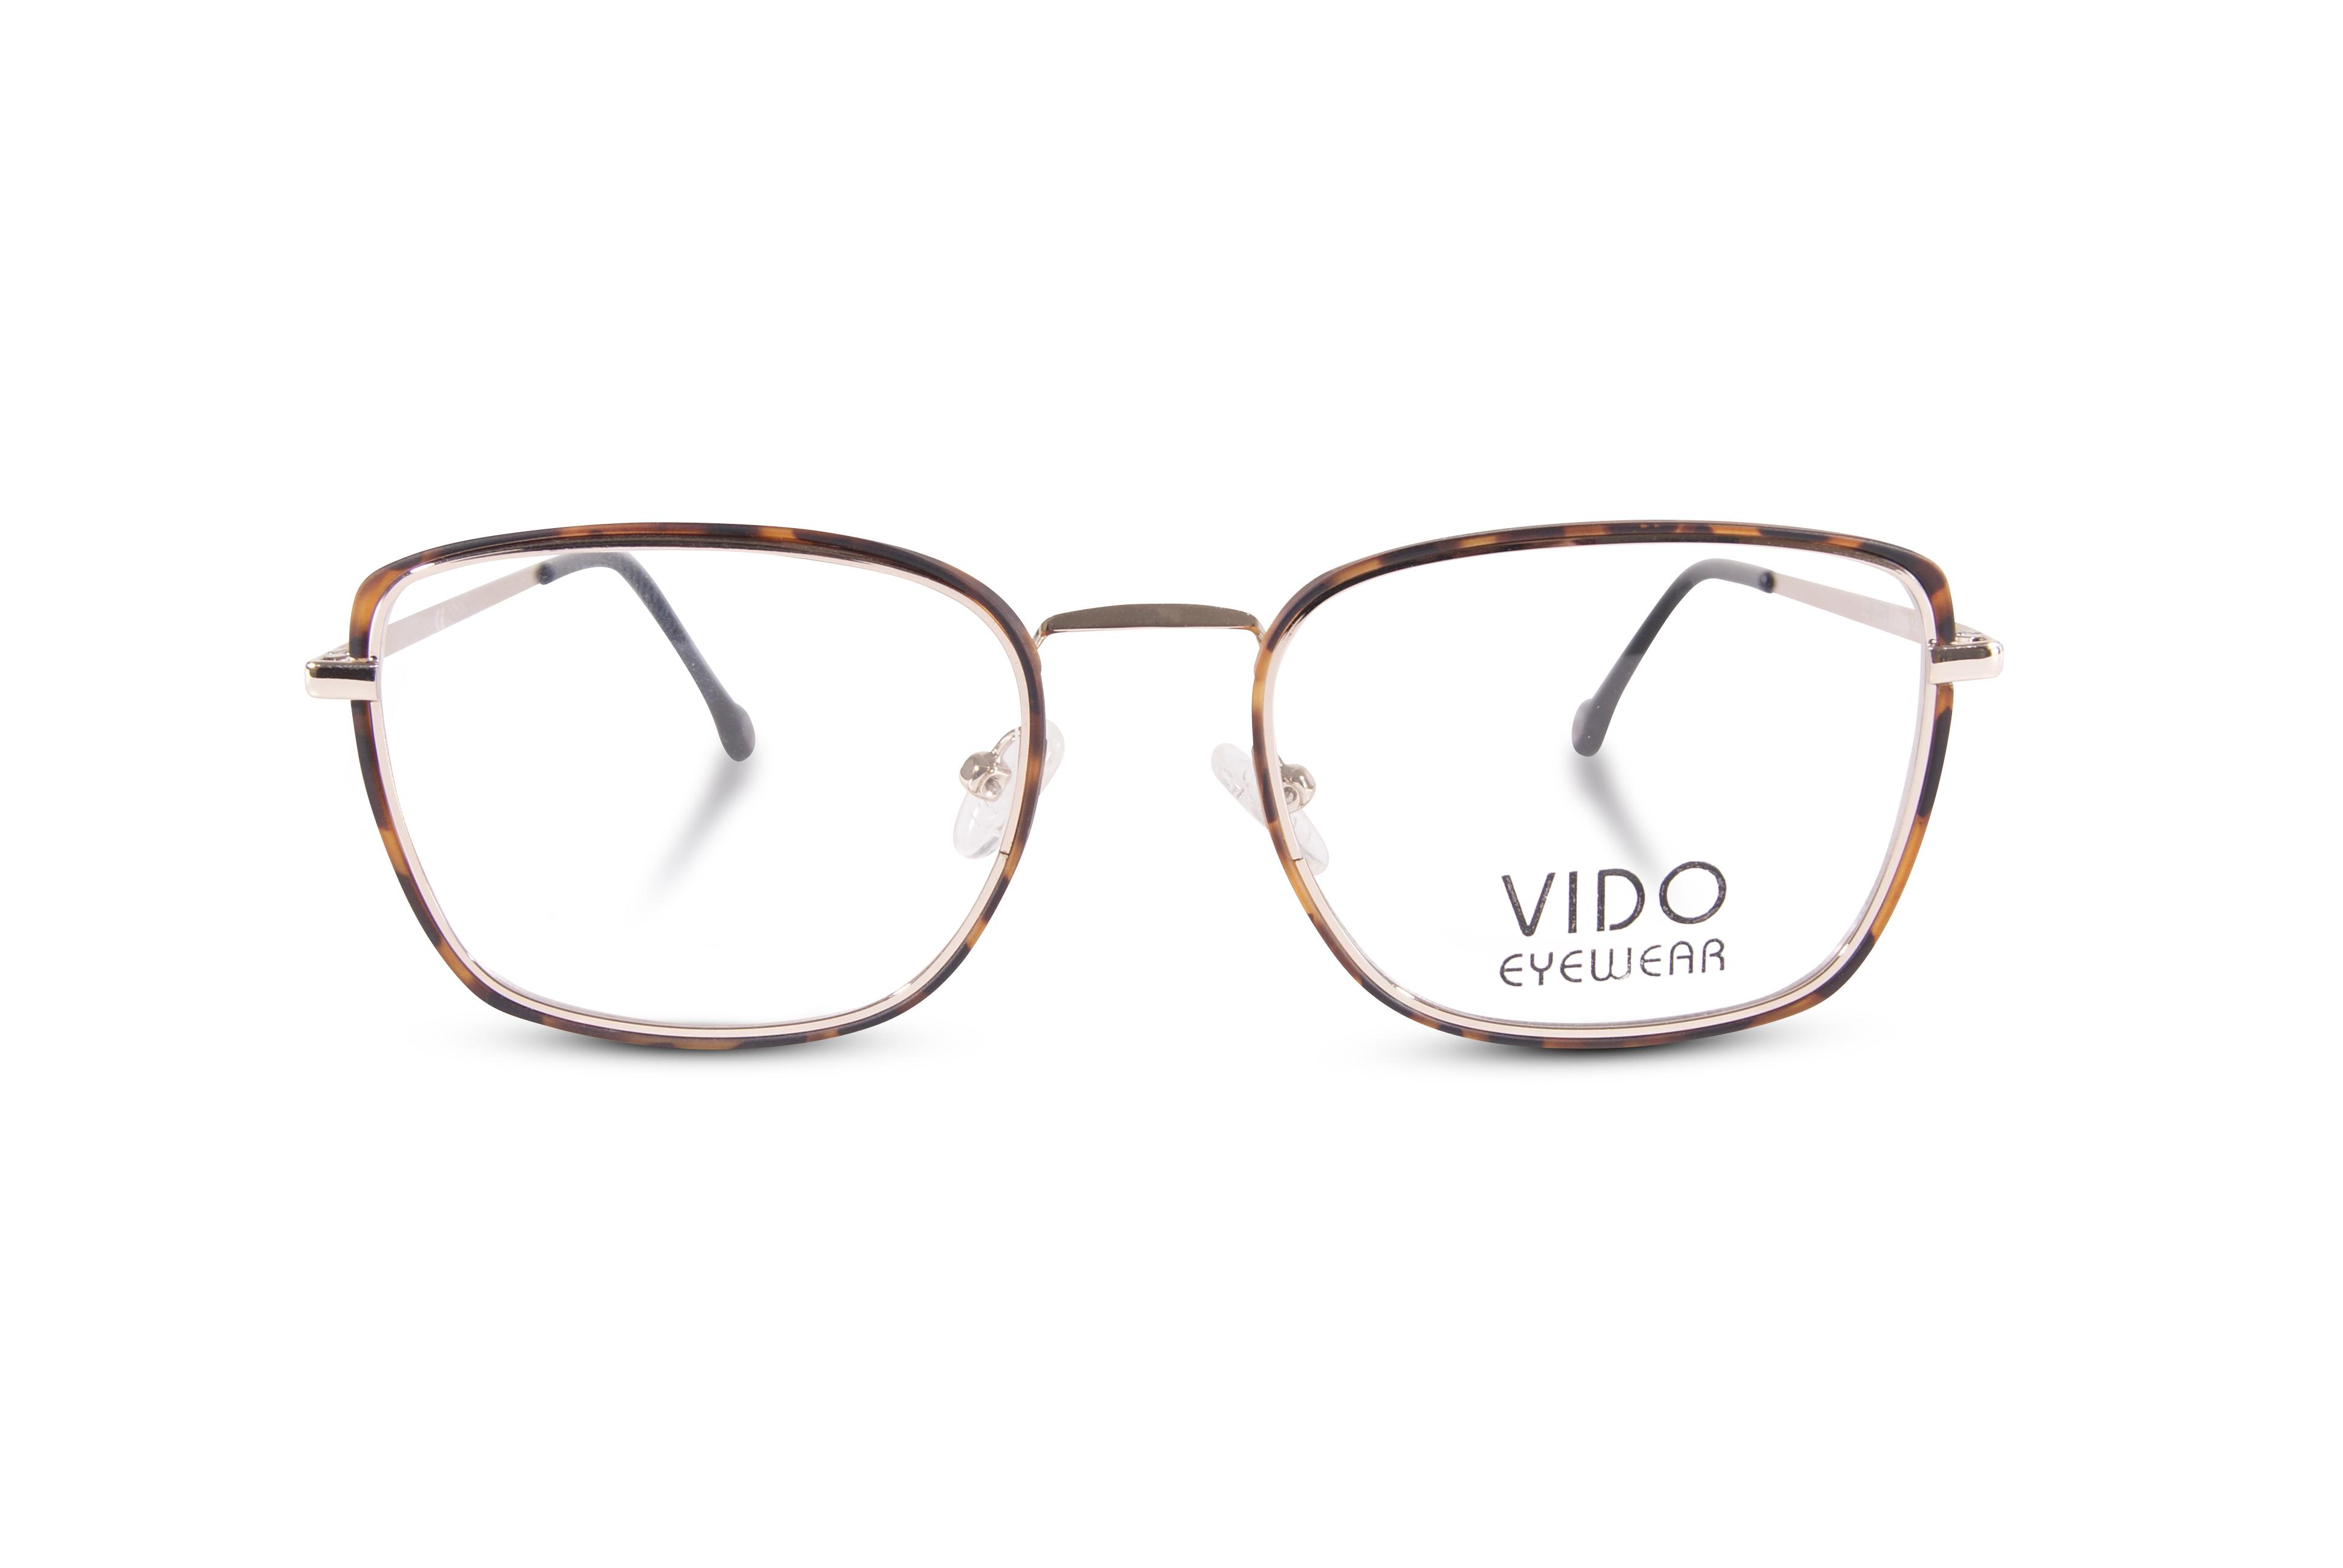 Rama clasica Vido -eyeware